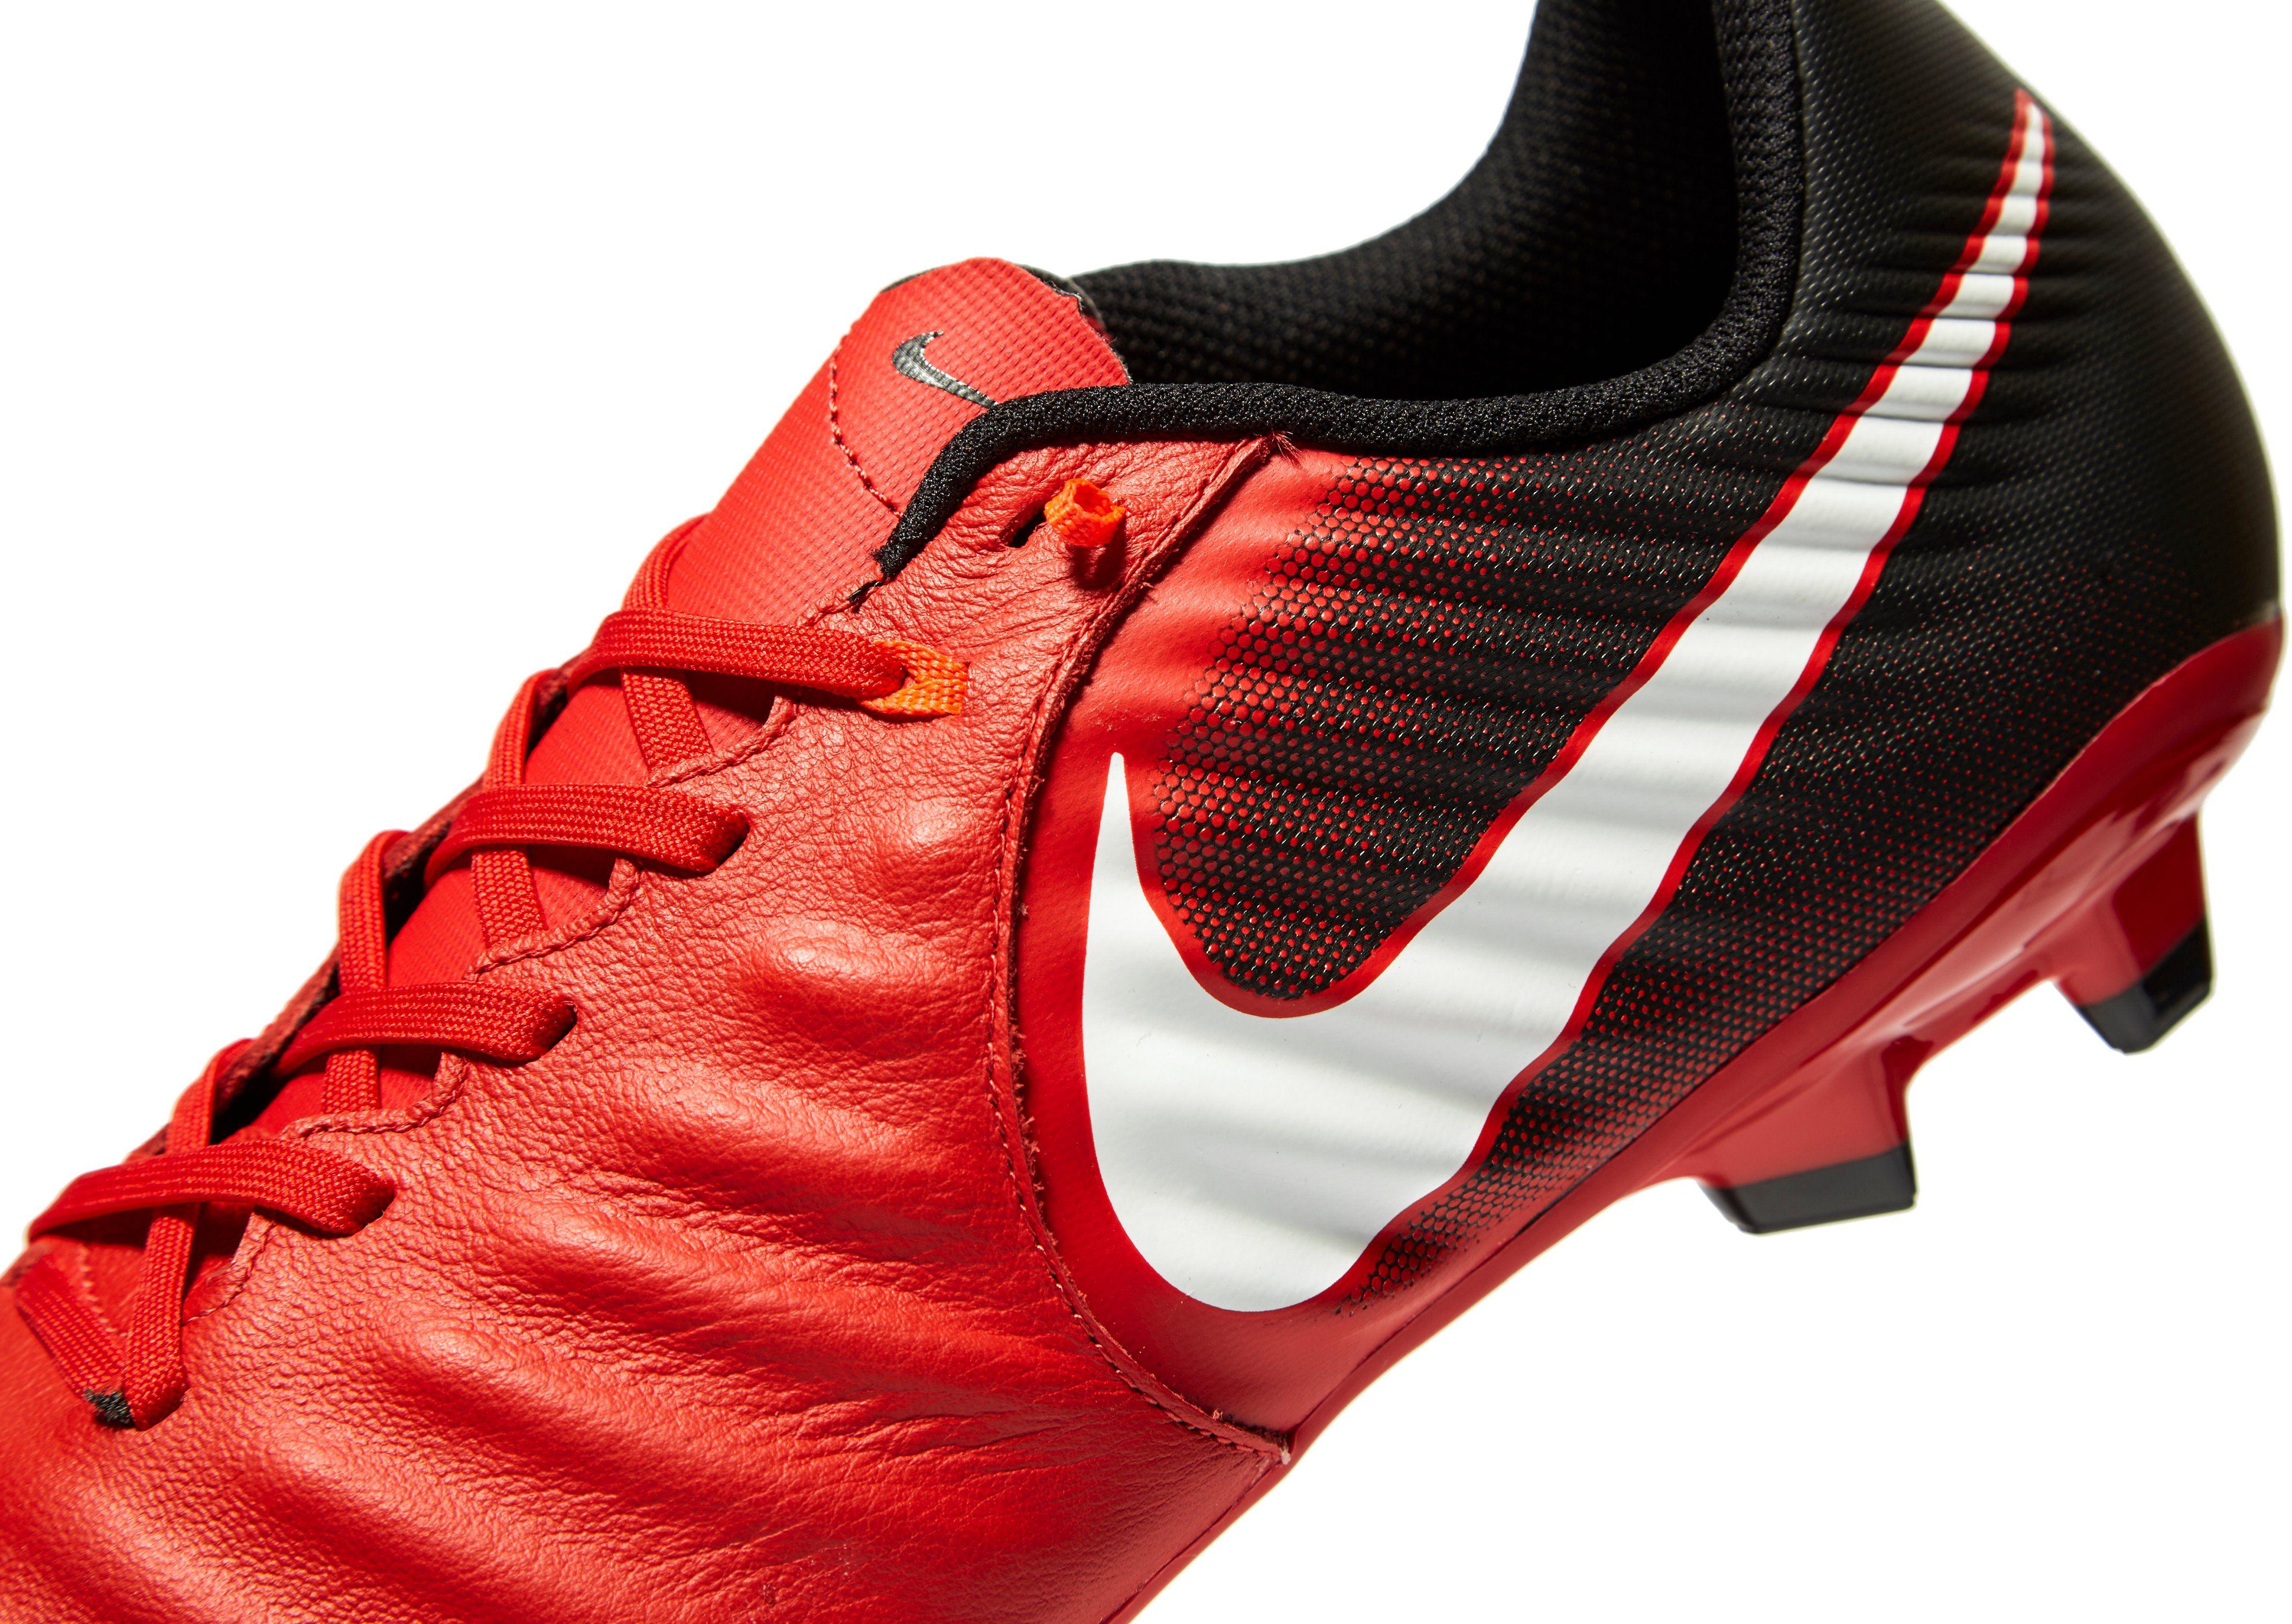 Nike Fire and Ice Tiempo Ligera IV FG